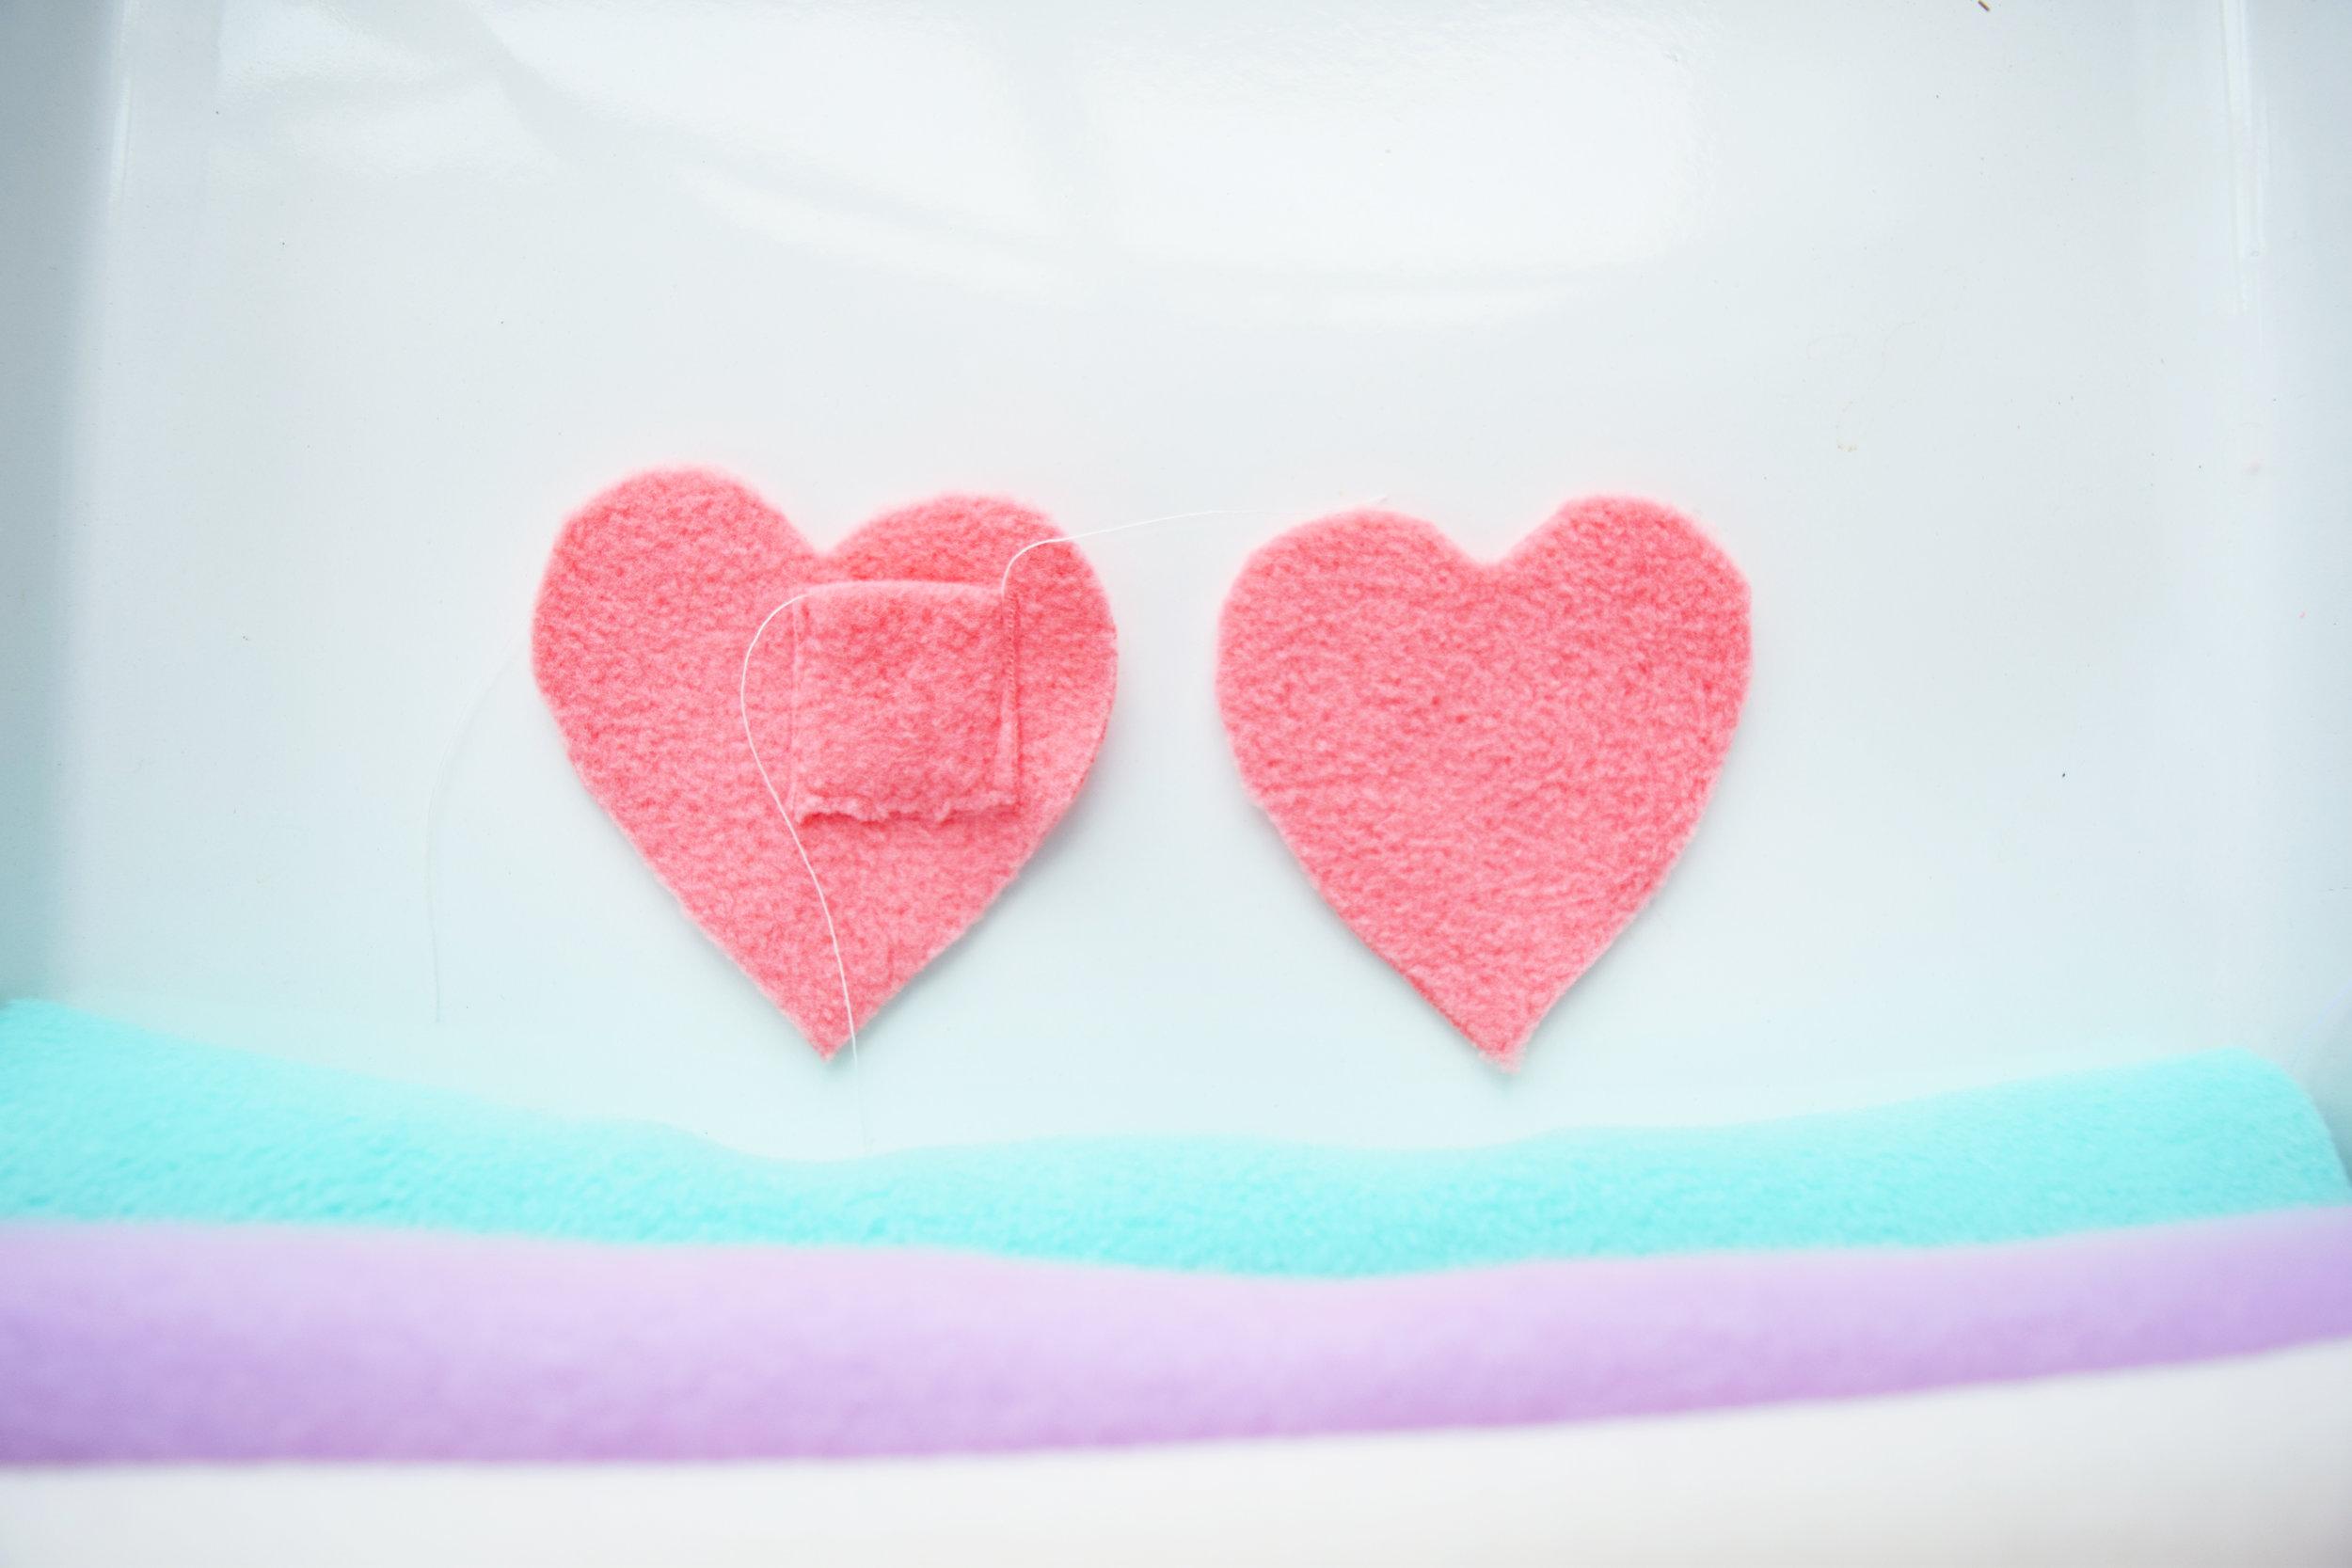 lavender_heart_valentines_15.jpg